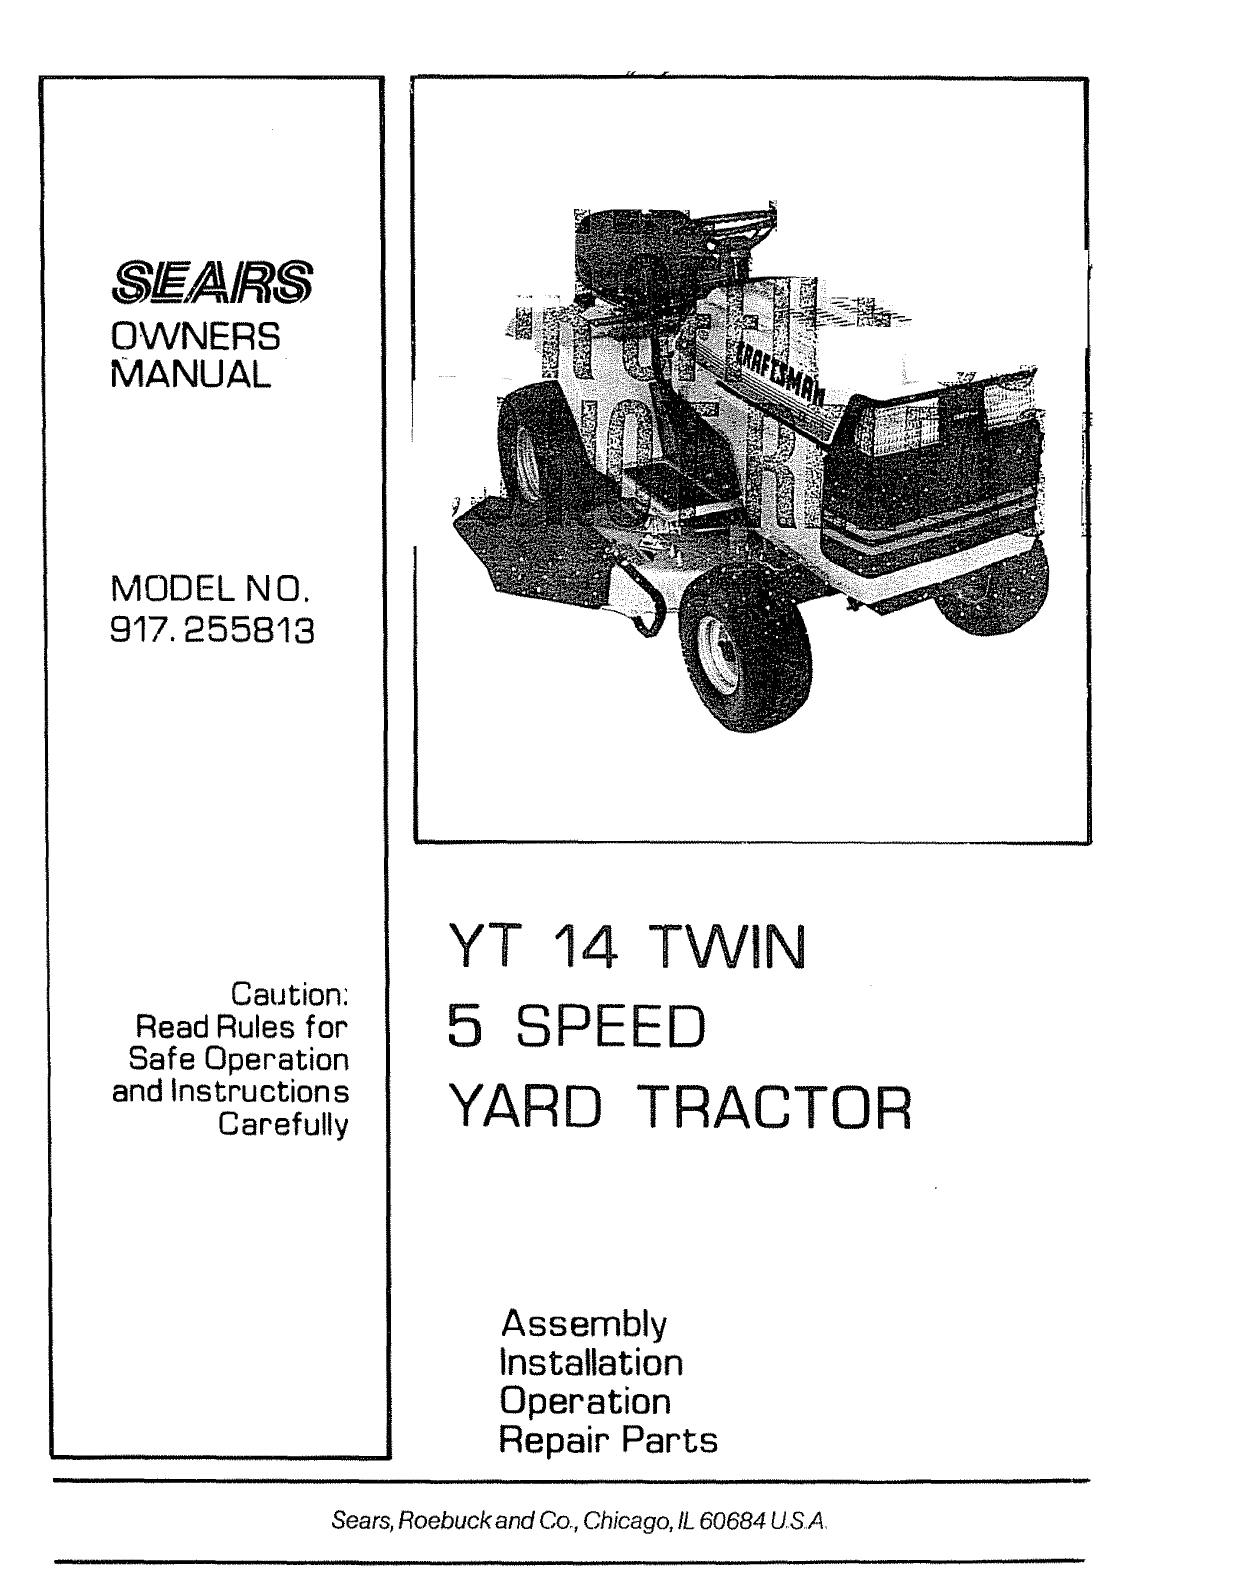 1986 craftsman yt tractor manual